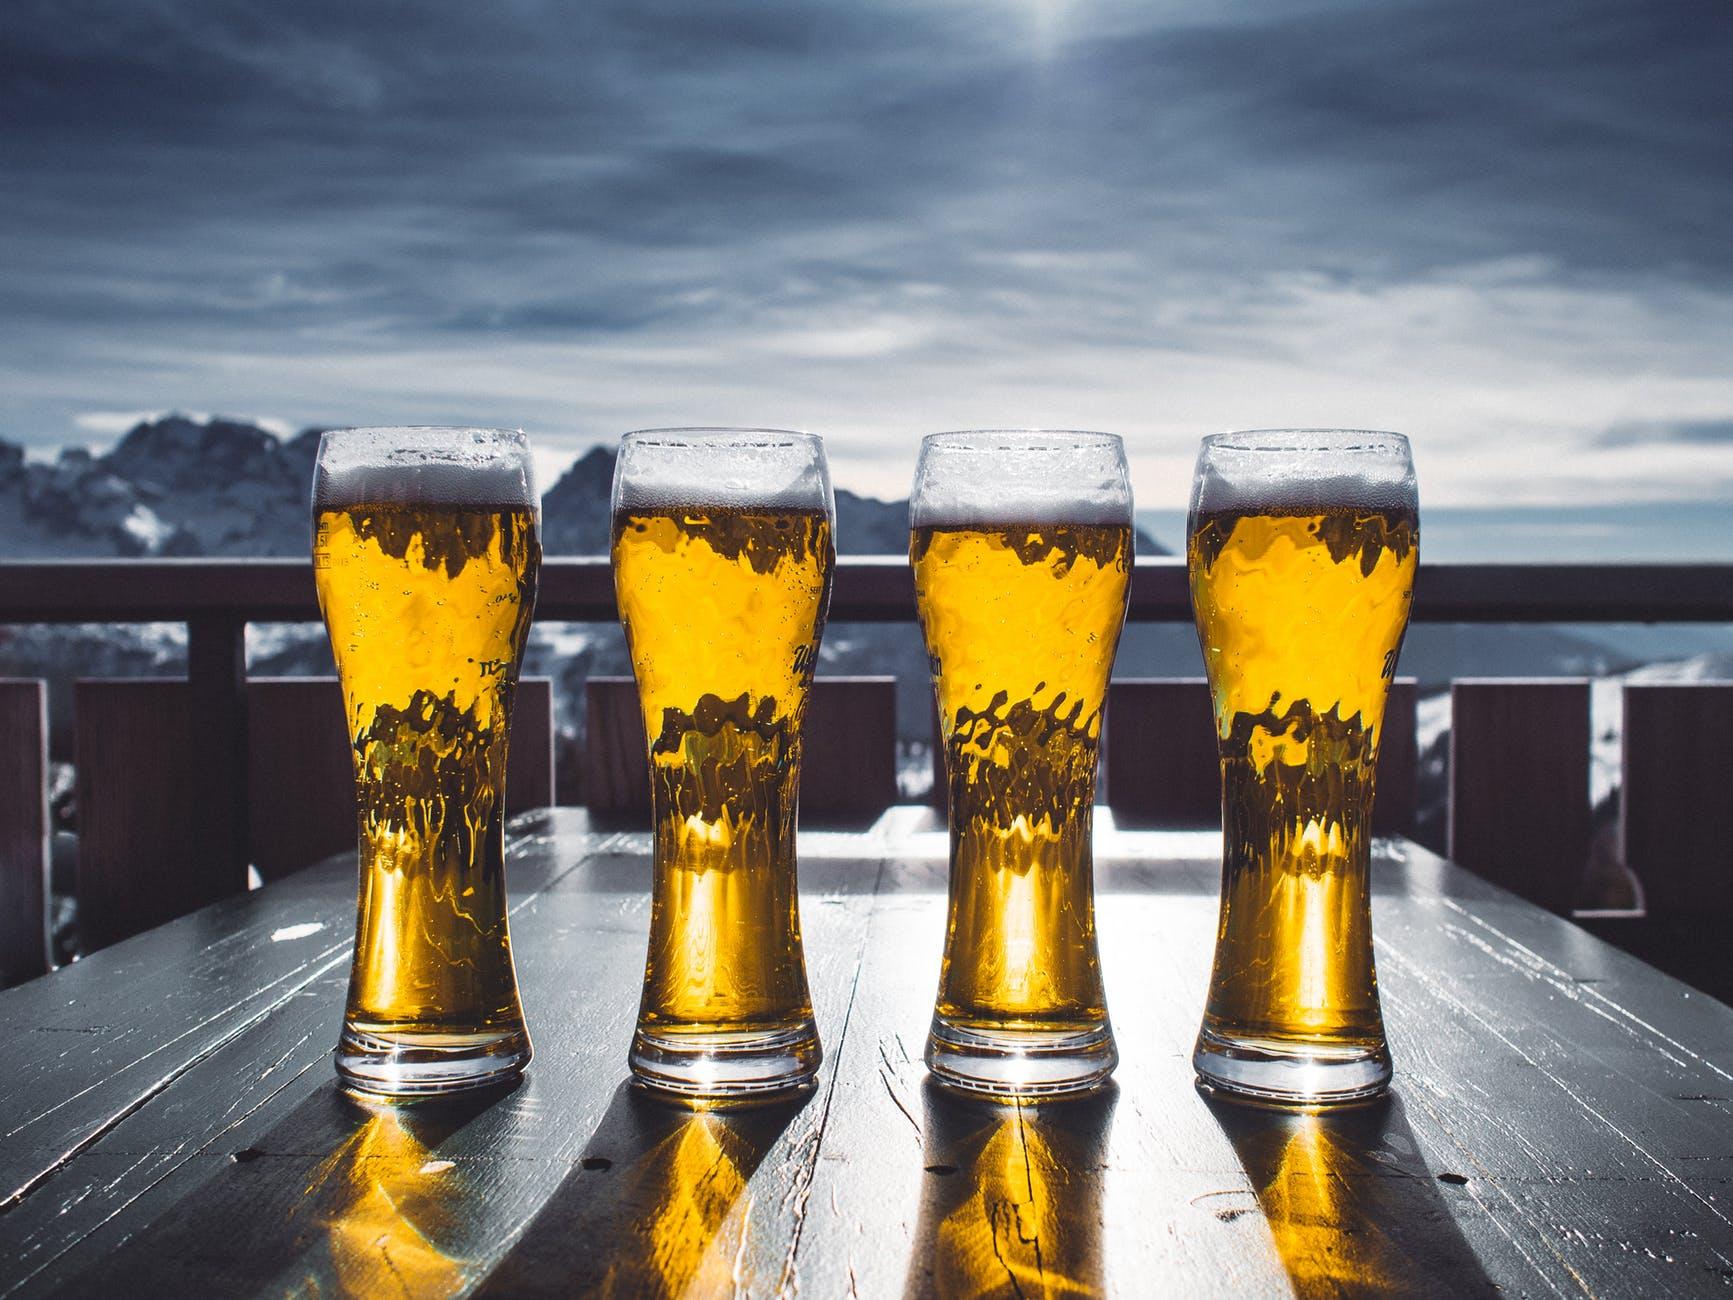 116 adjectives words to describe Beer